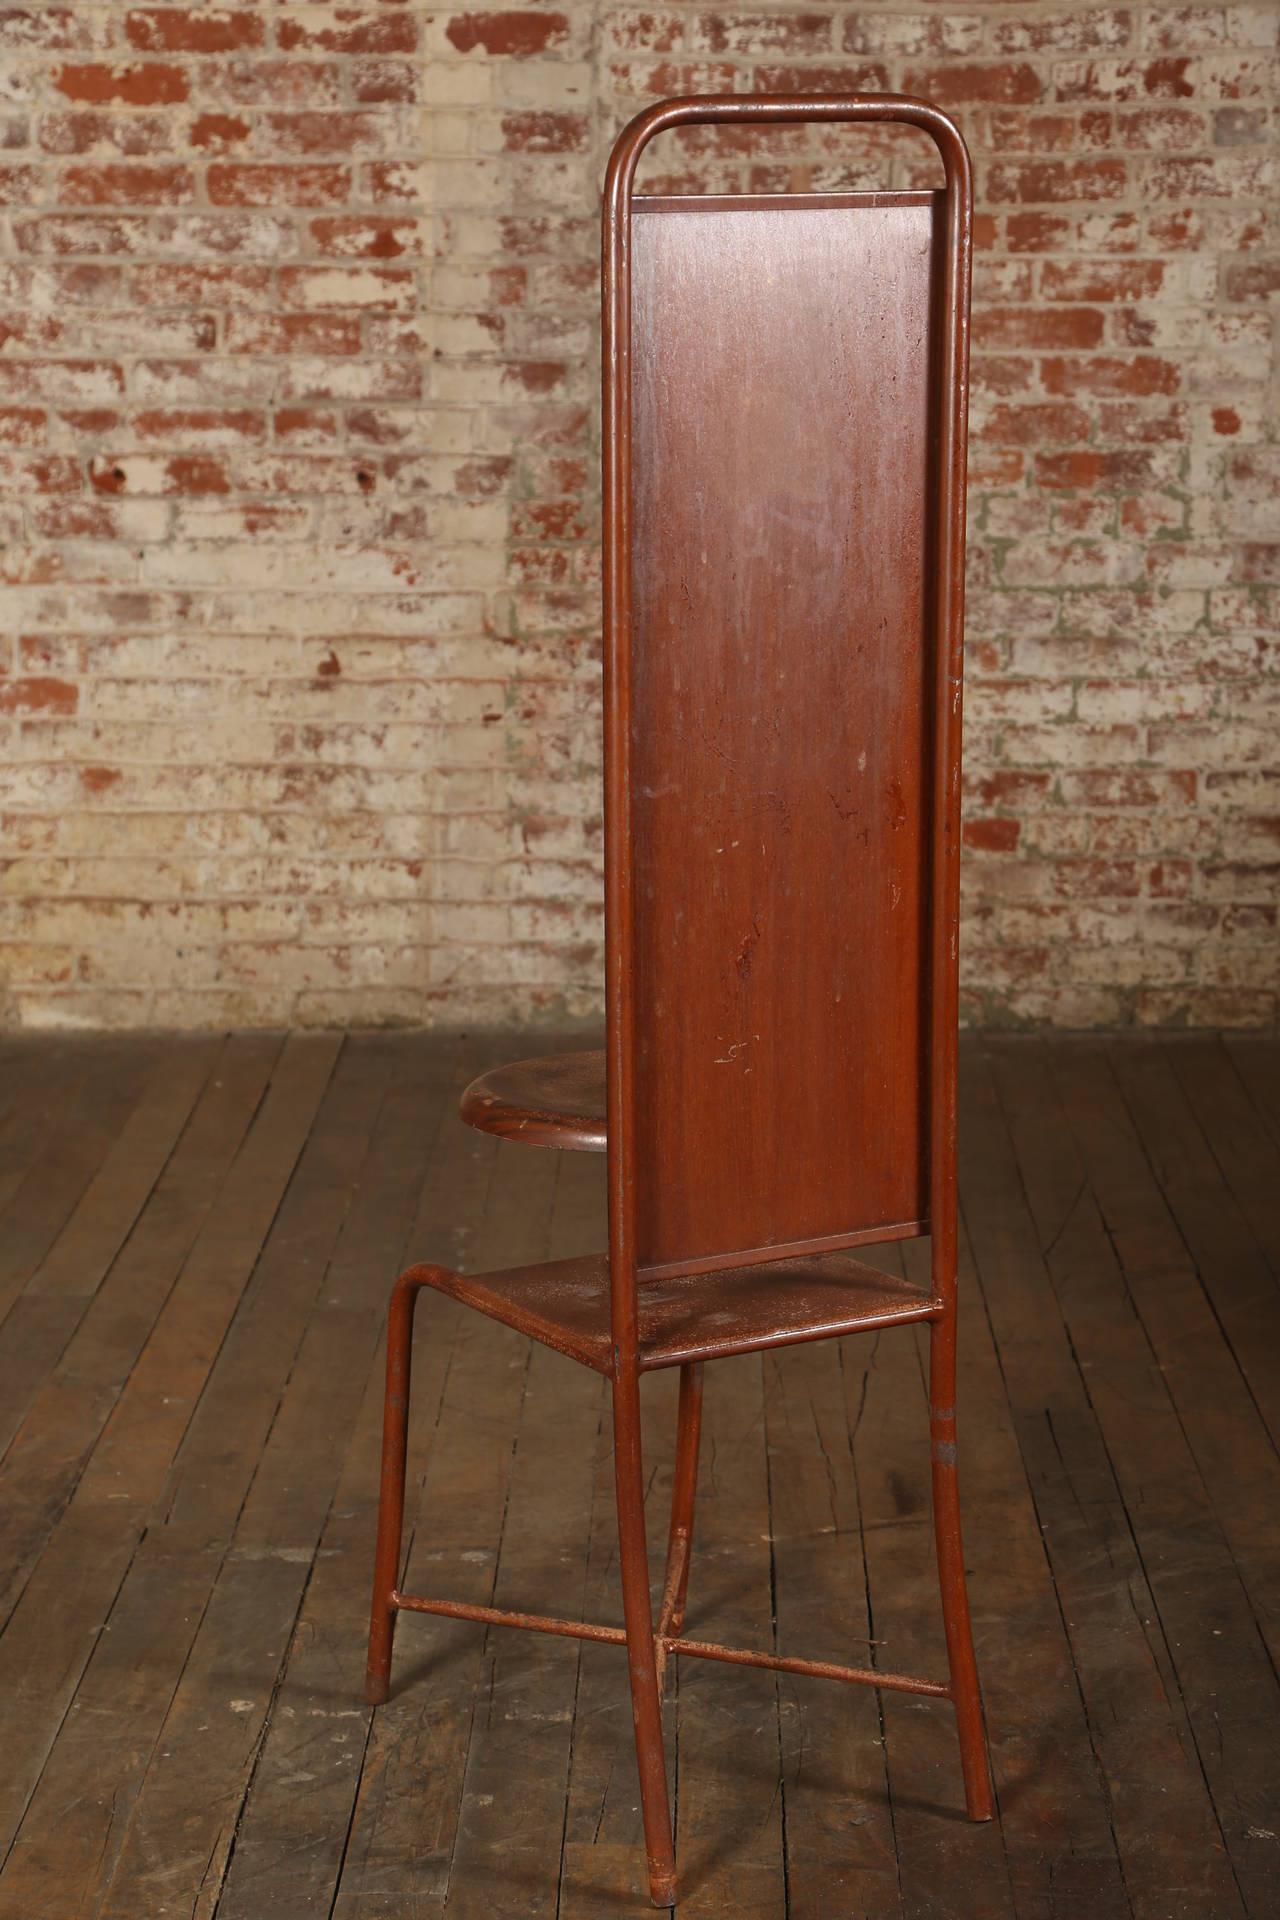 Original, Vintage Adjustable Medical Stool or Chair 6